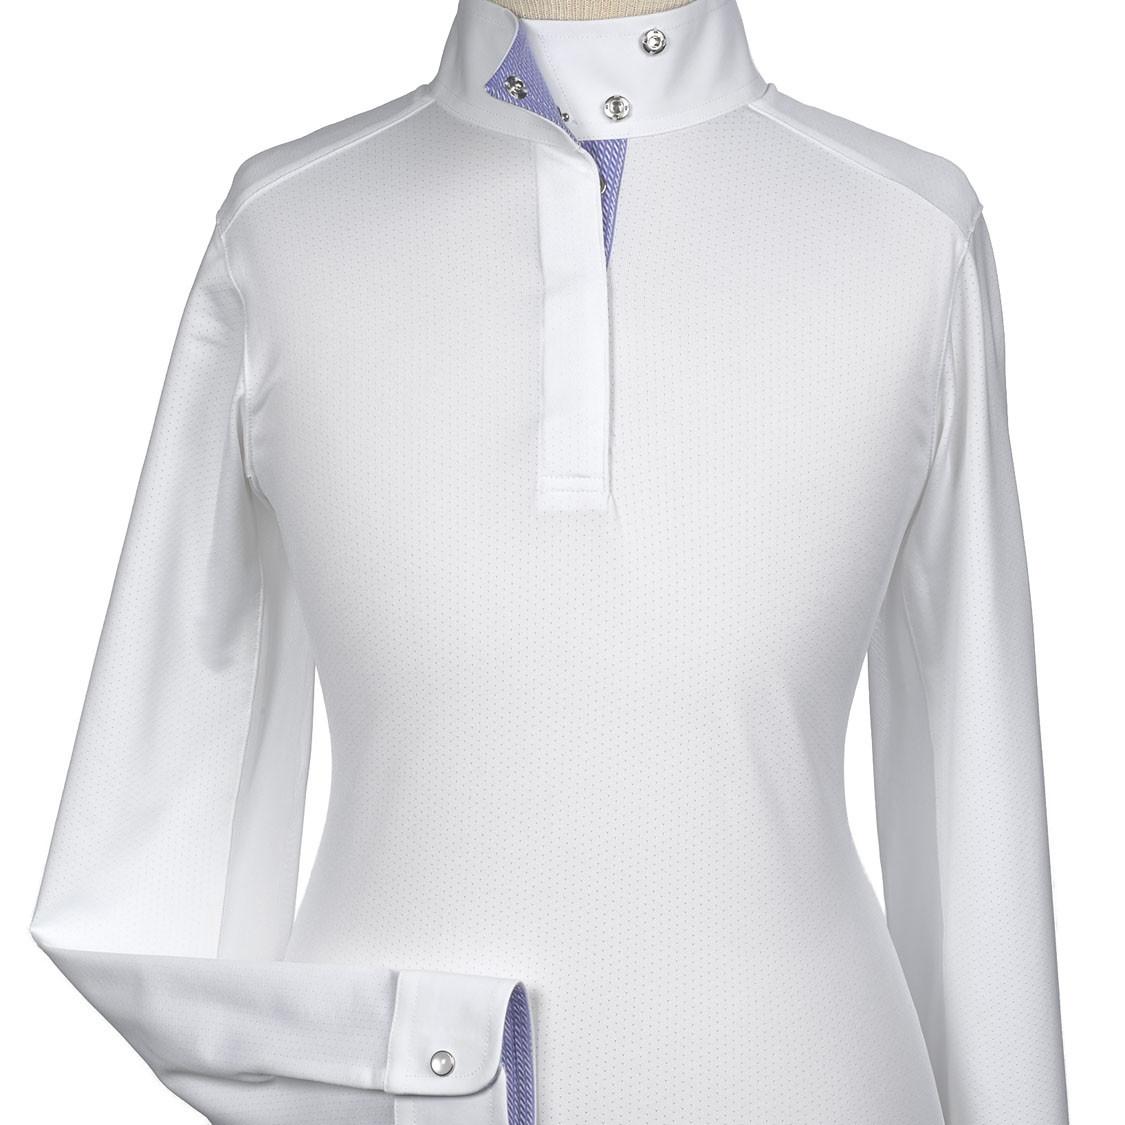 "Essex Beacon Hill Girls Talent Yarn ""Halston"" Wrap Collar Show Shirt"